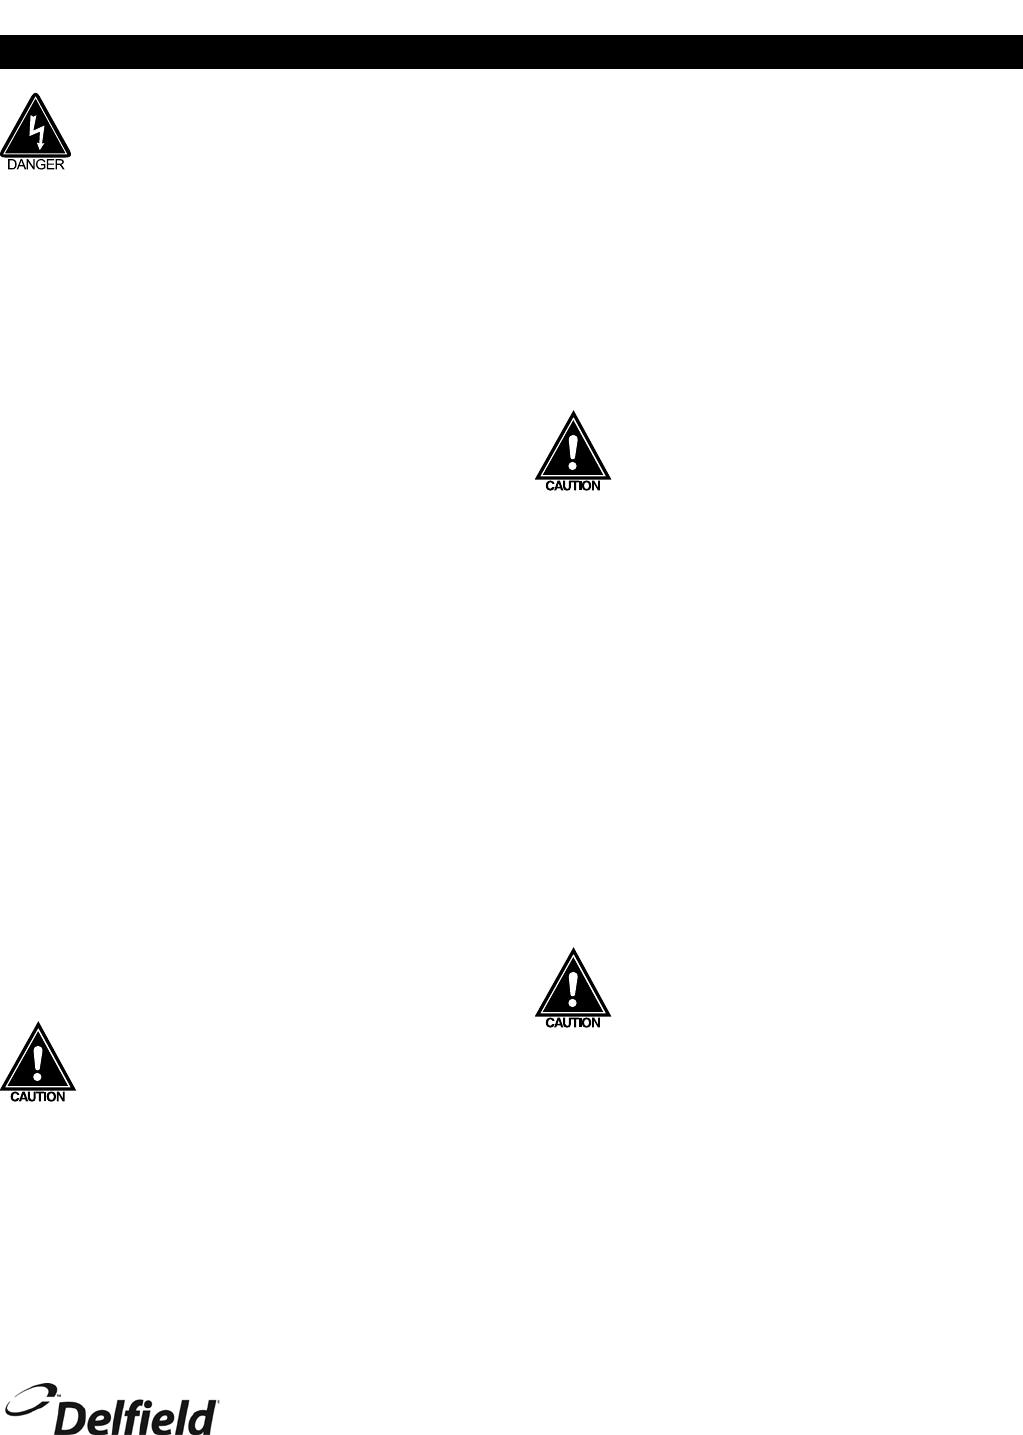 [SCHEMATICS_4UK]  879C8D1 Delfield Freezer Wiring Diagram Mini   Wiring Library   Delfield Freezer Wiring Diagram Mini      Wiring Library